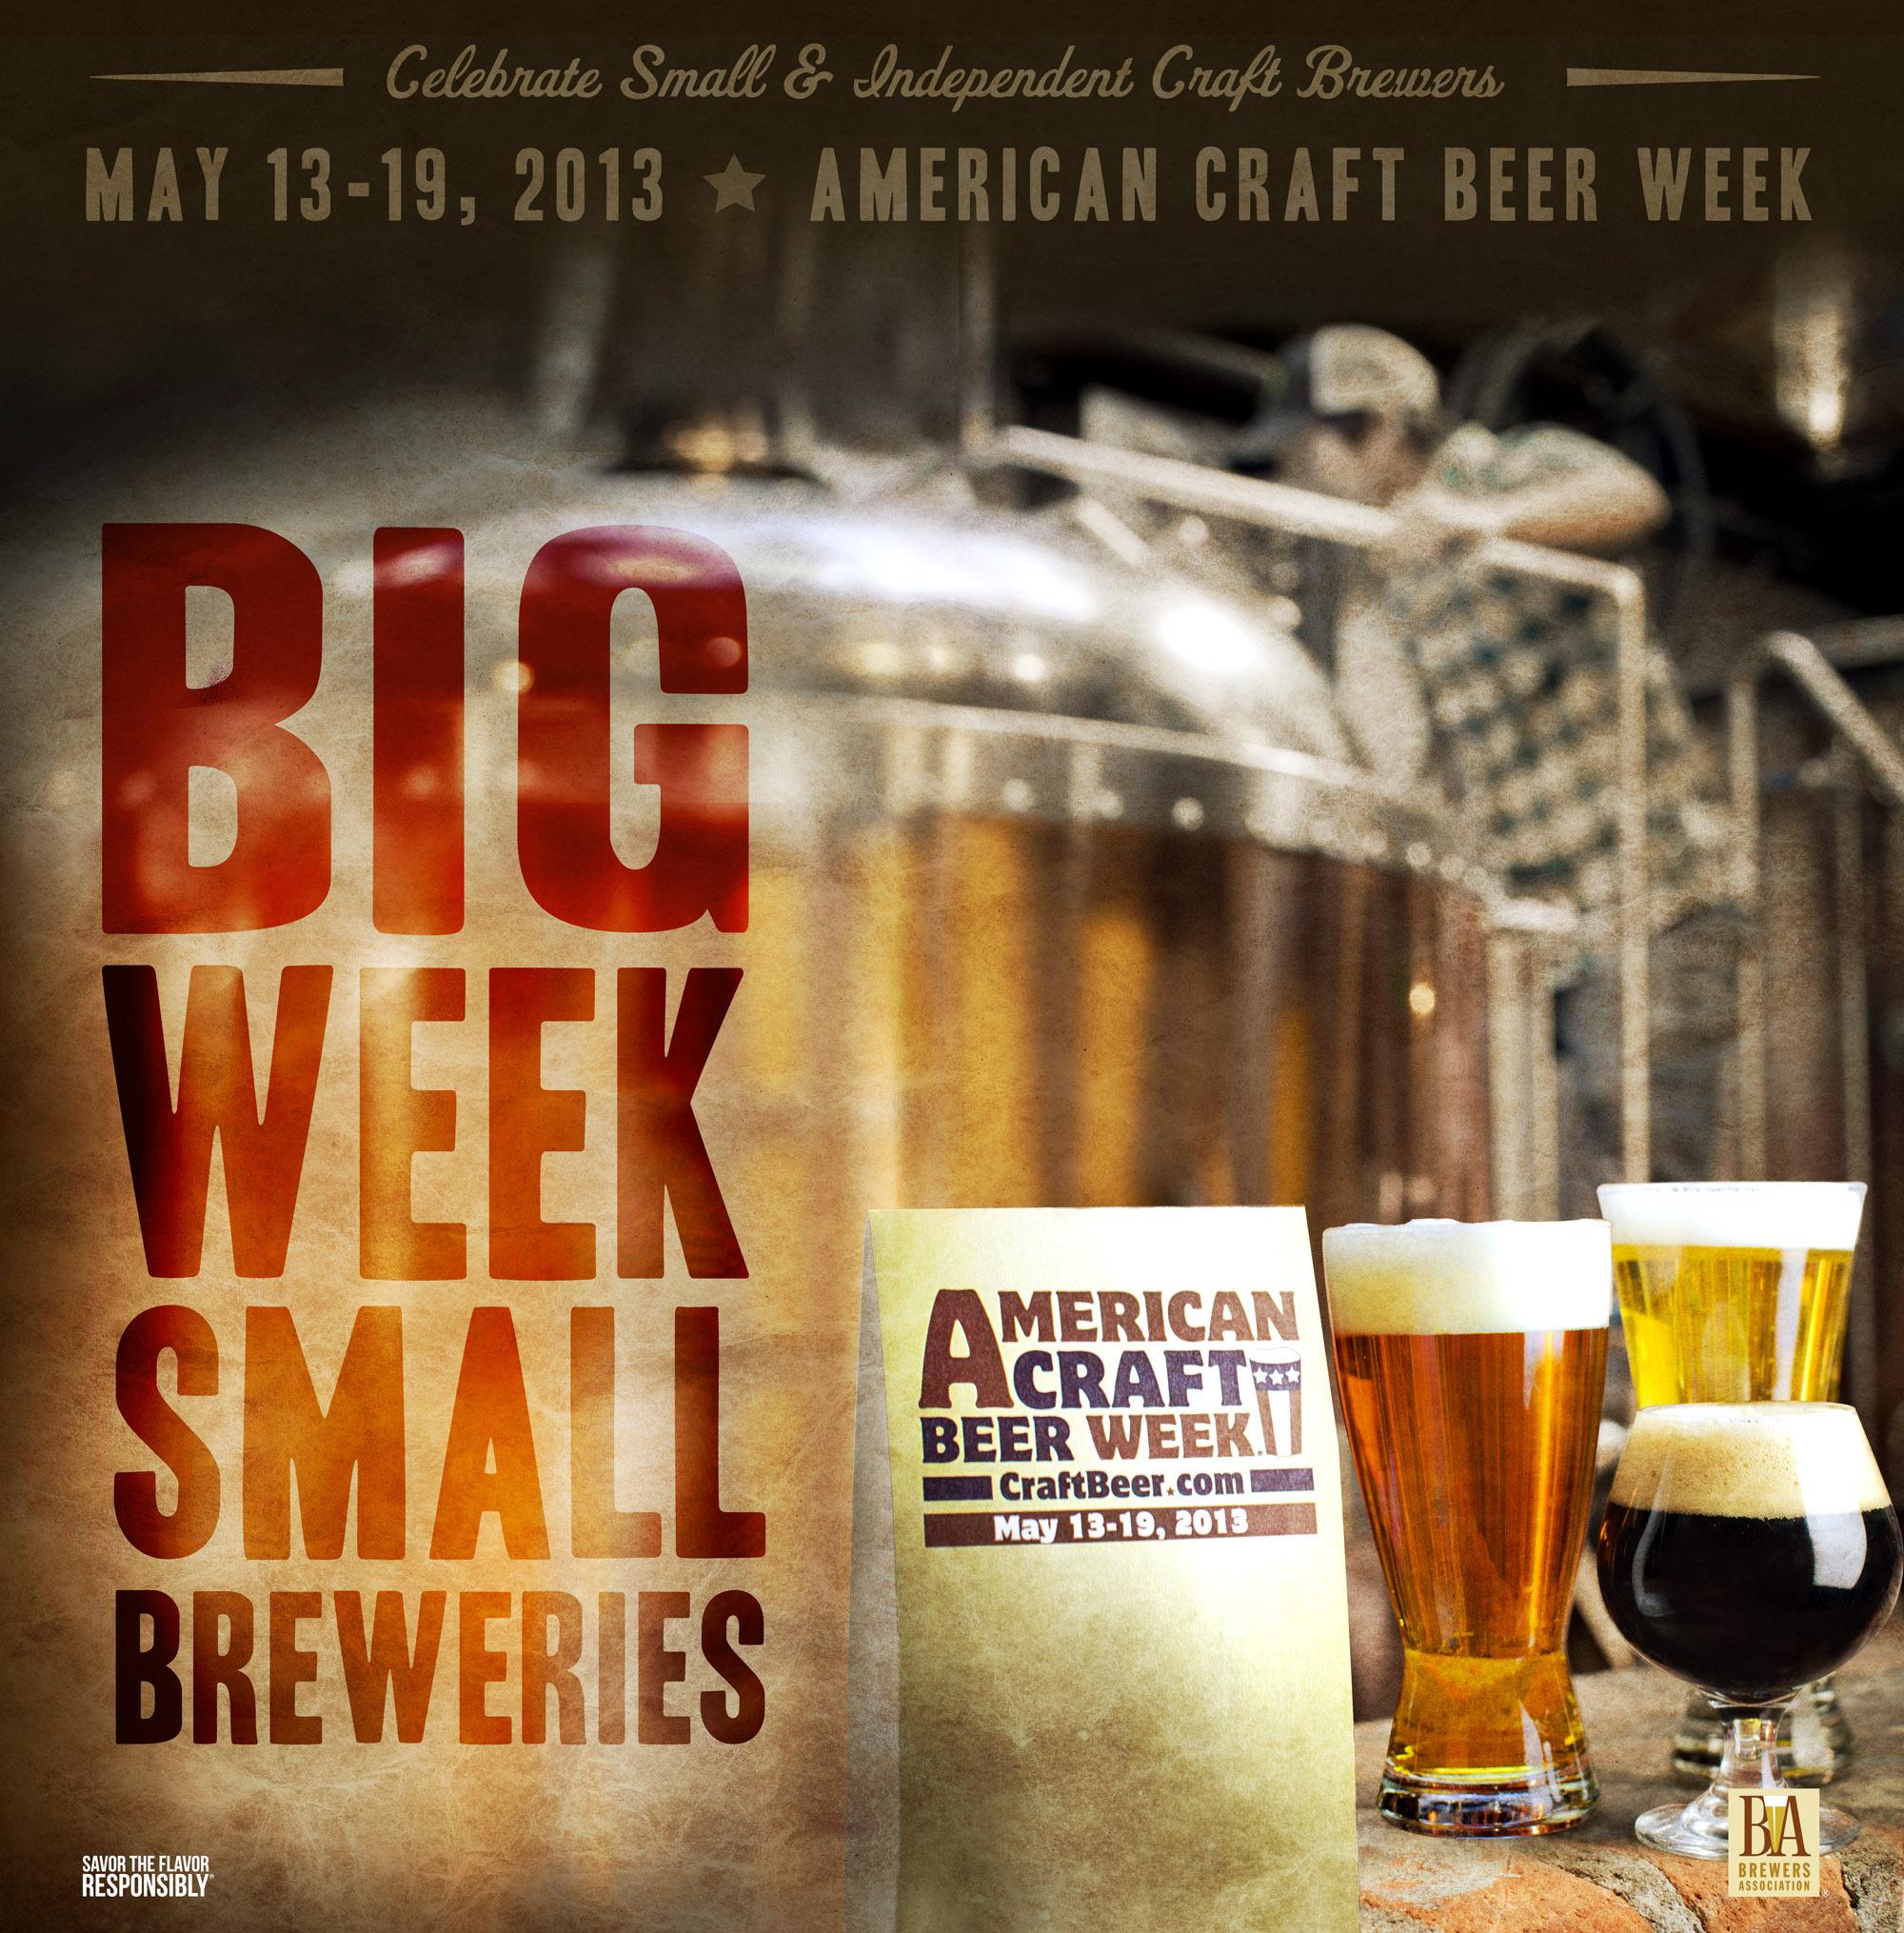 American Craft Beer Week 2013 (Photo: Business Wire)